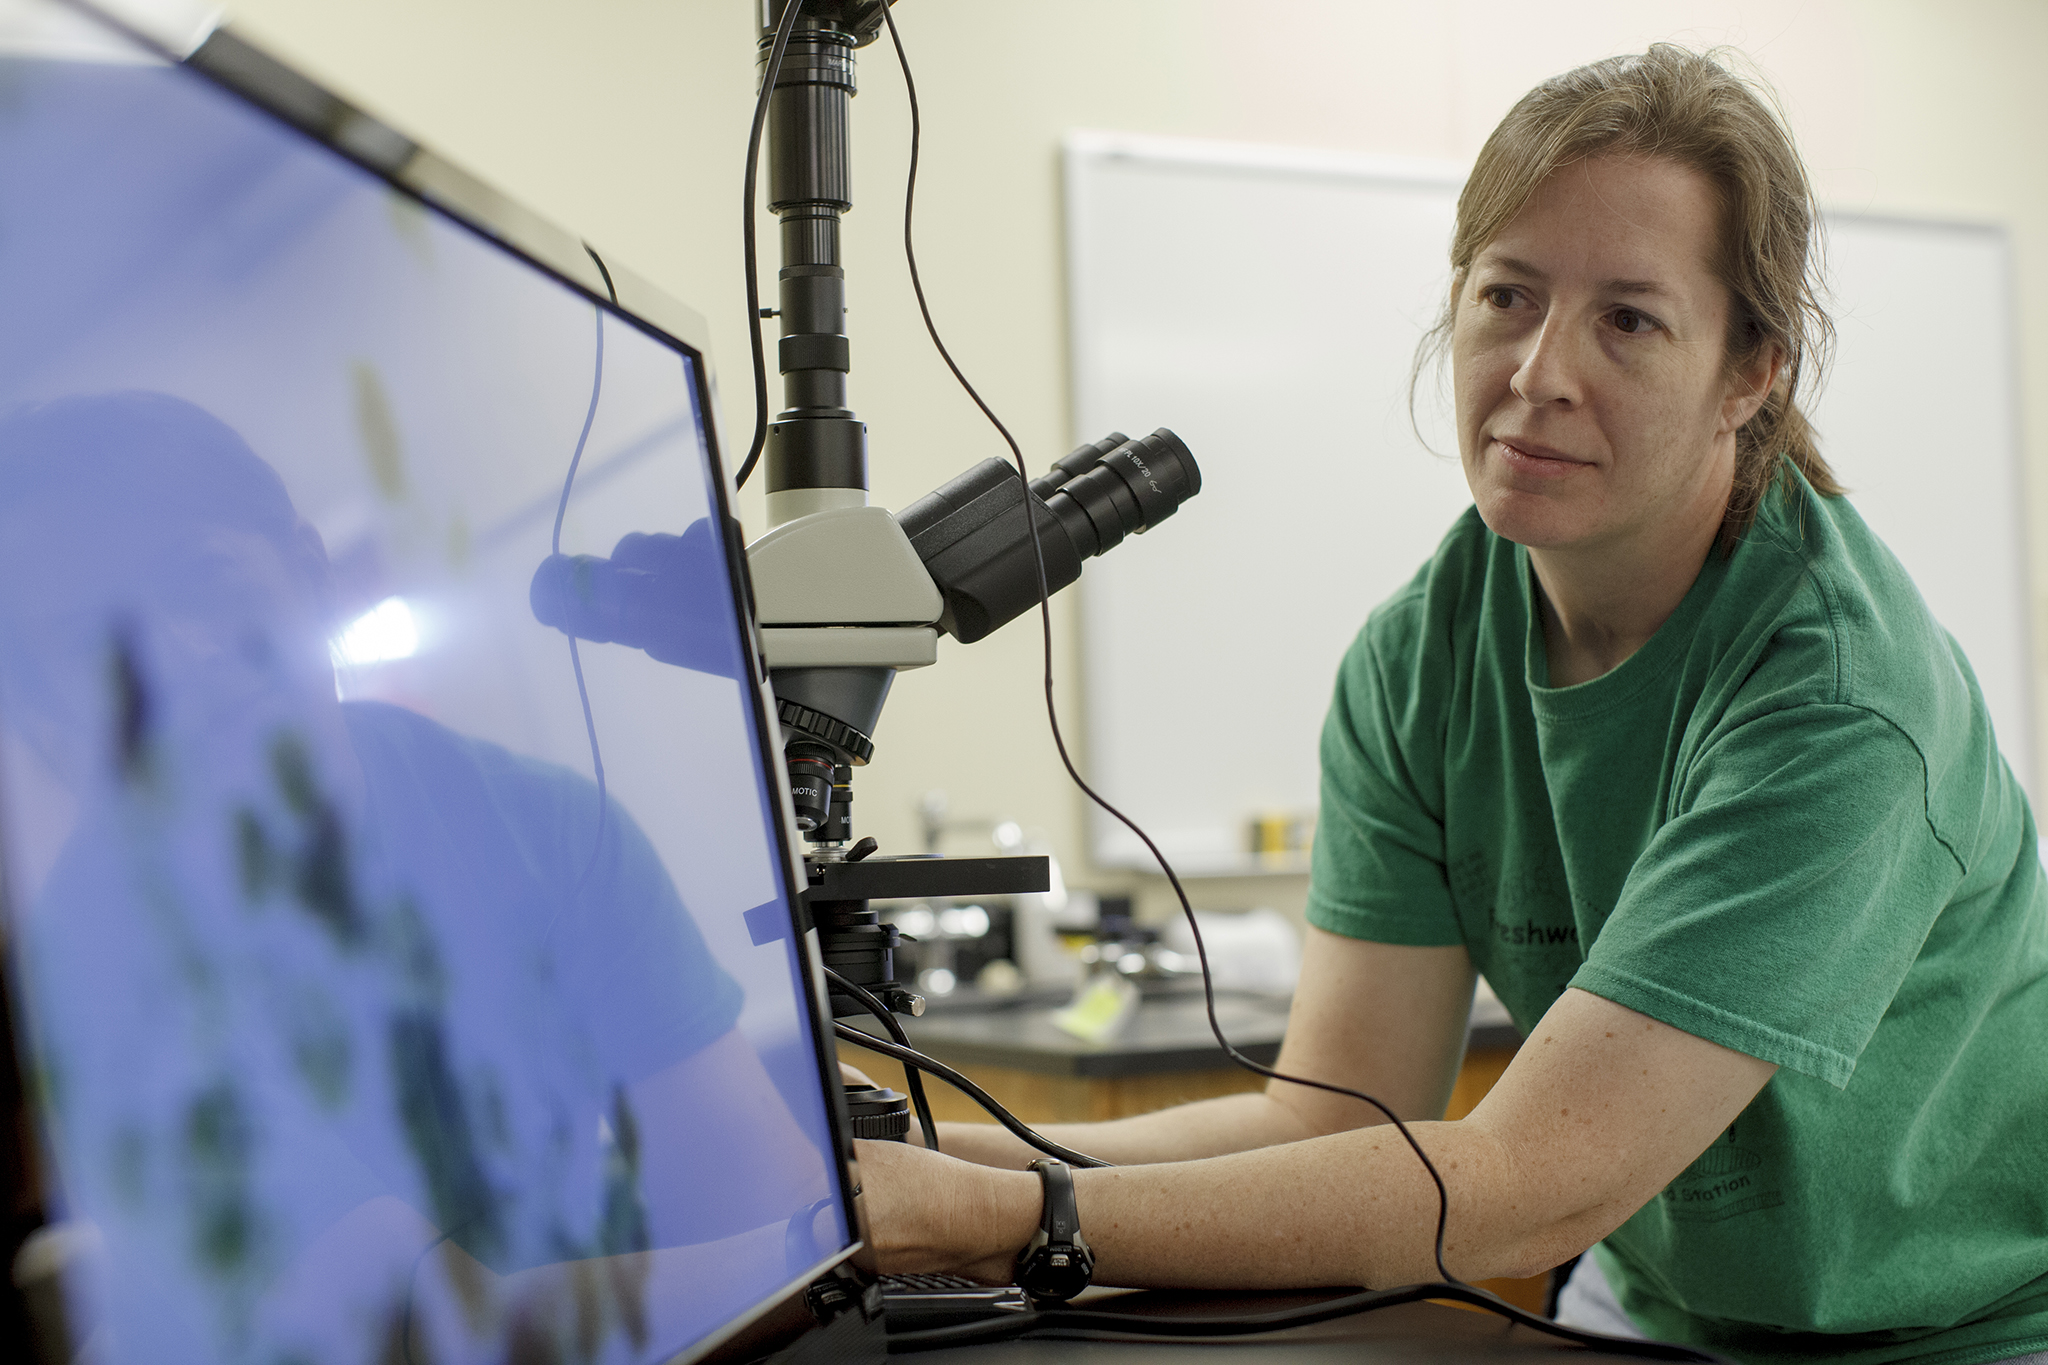 Dr. Jennifer Greenwood is pictured atthe university's Reelfoot Lake Environmental Field Station in Samburg, Tenn.